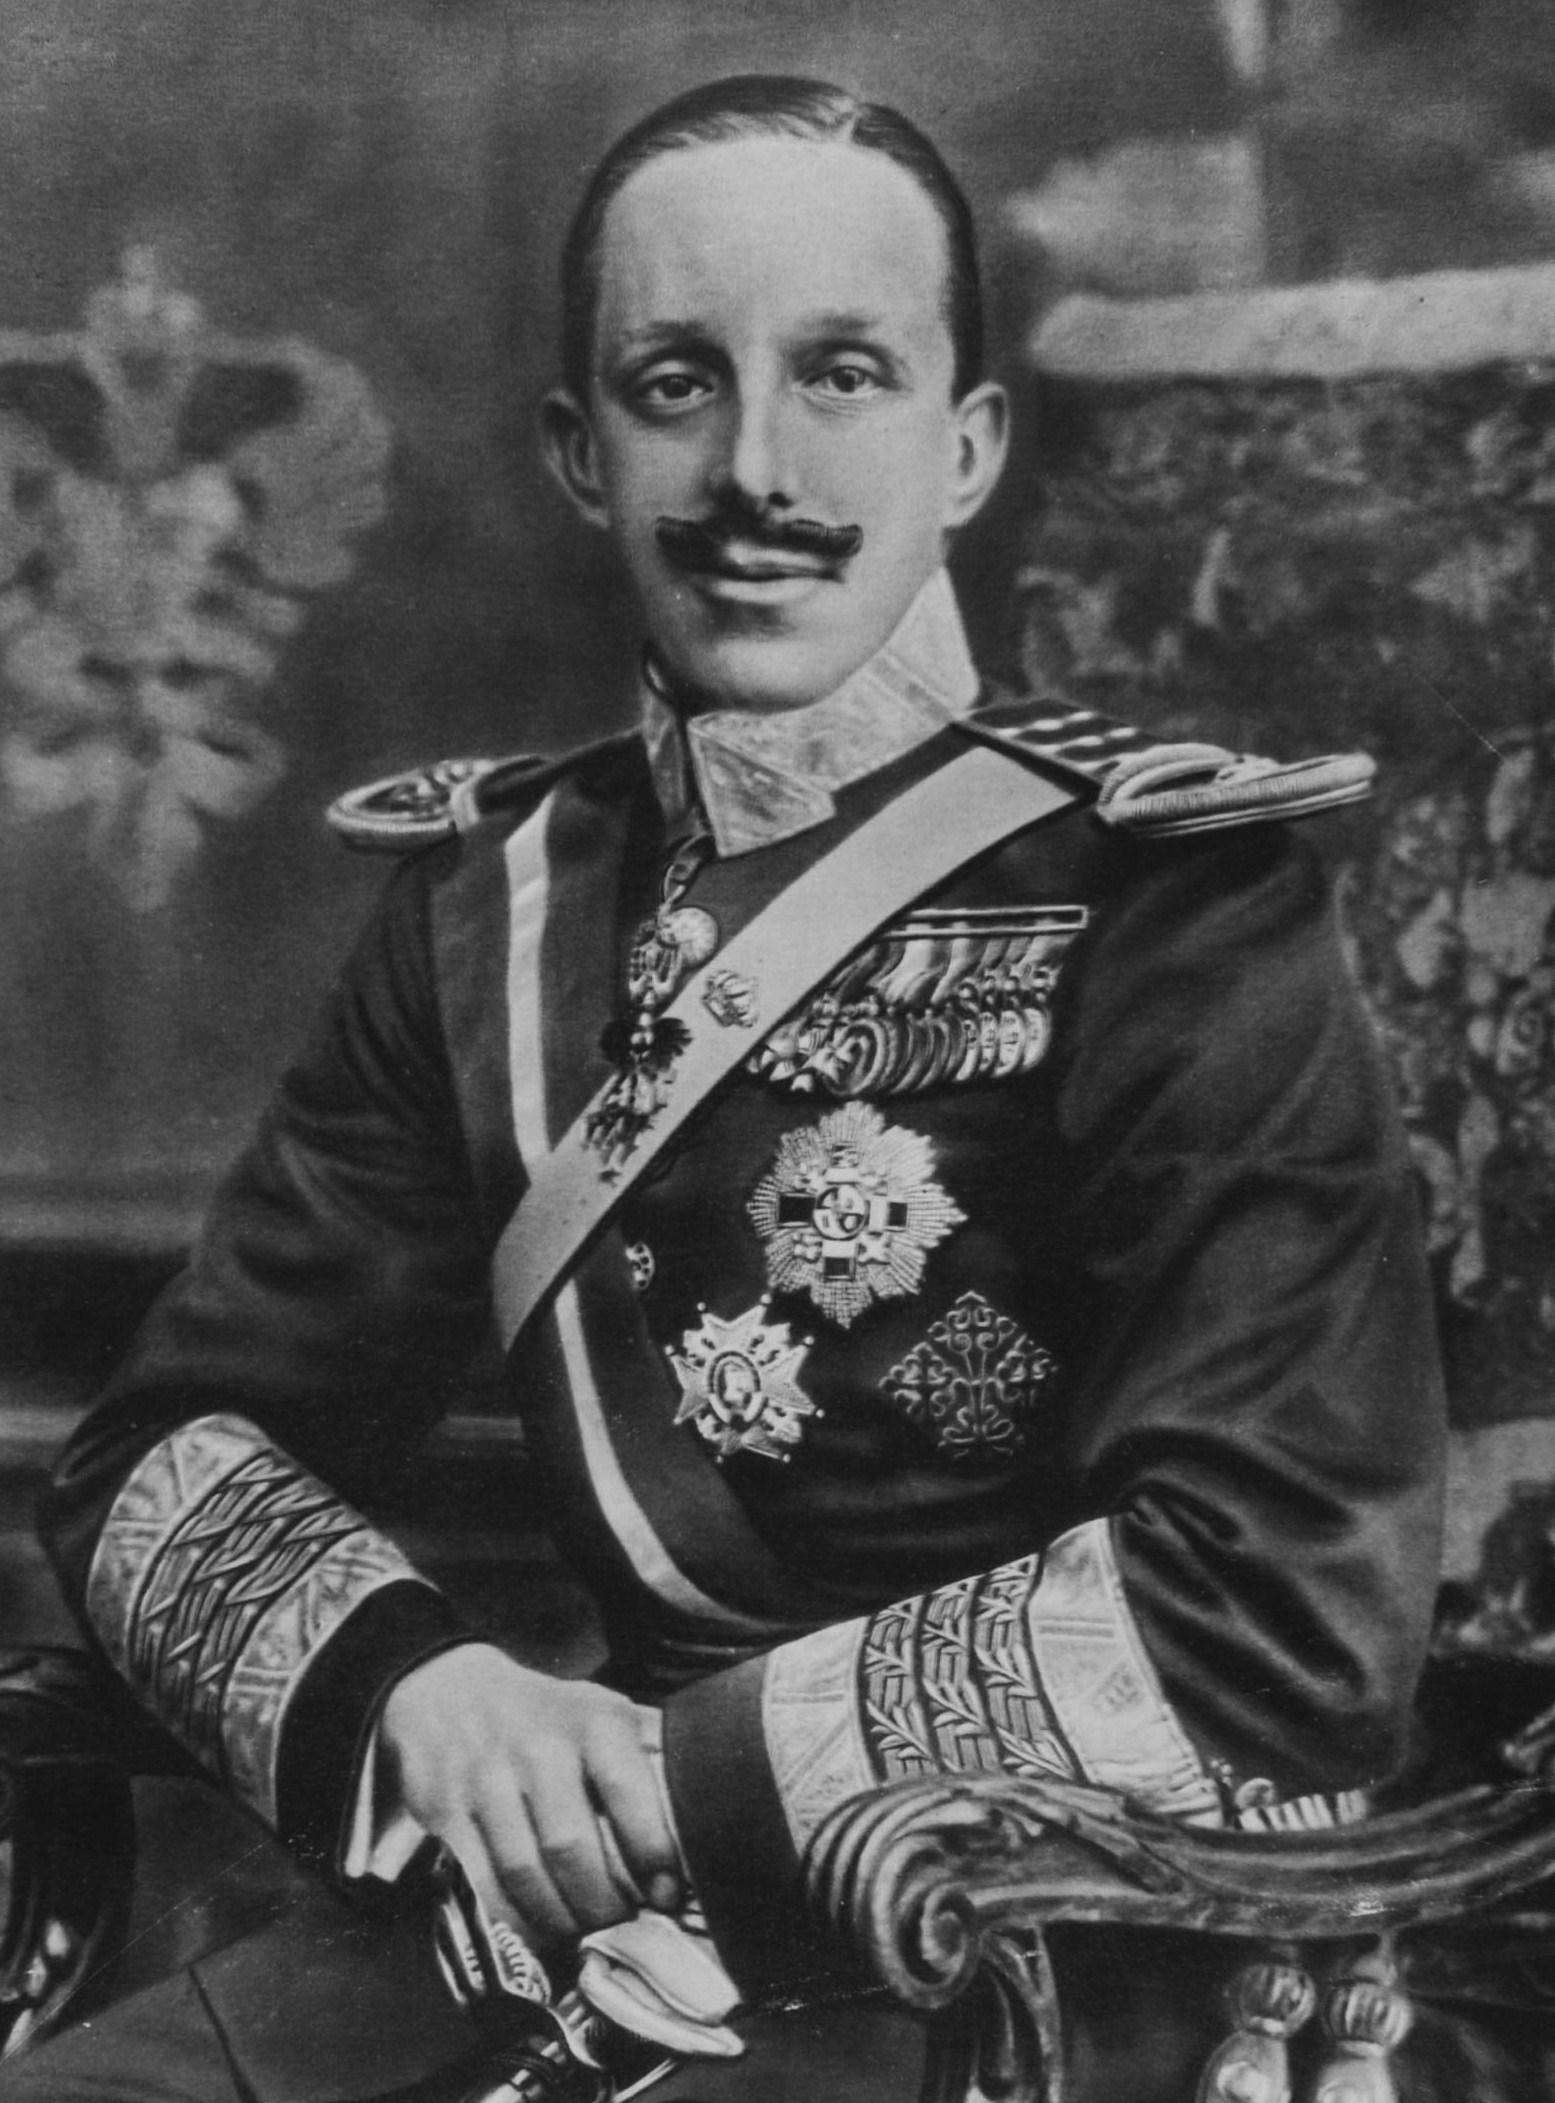 File:Alfonso XIII de España by Kaulak.jpg - Wikimedia Commons